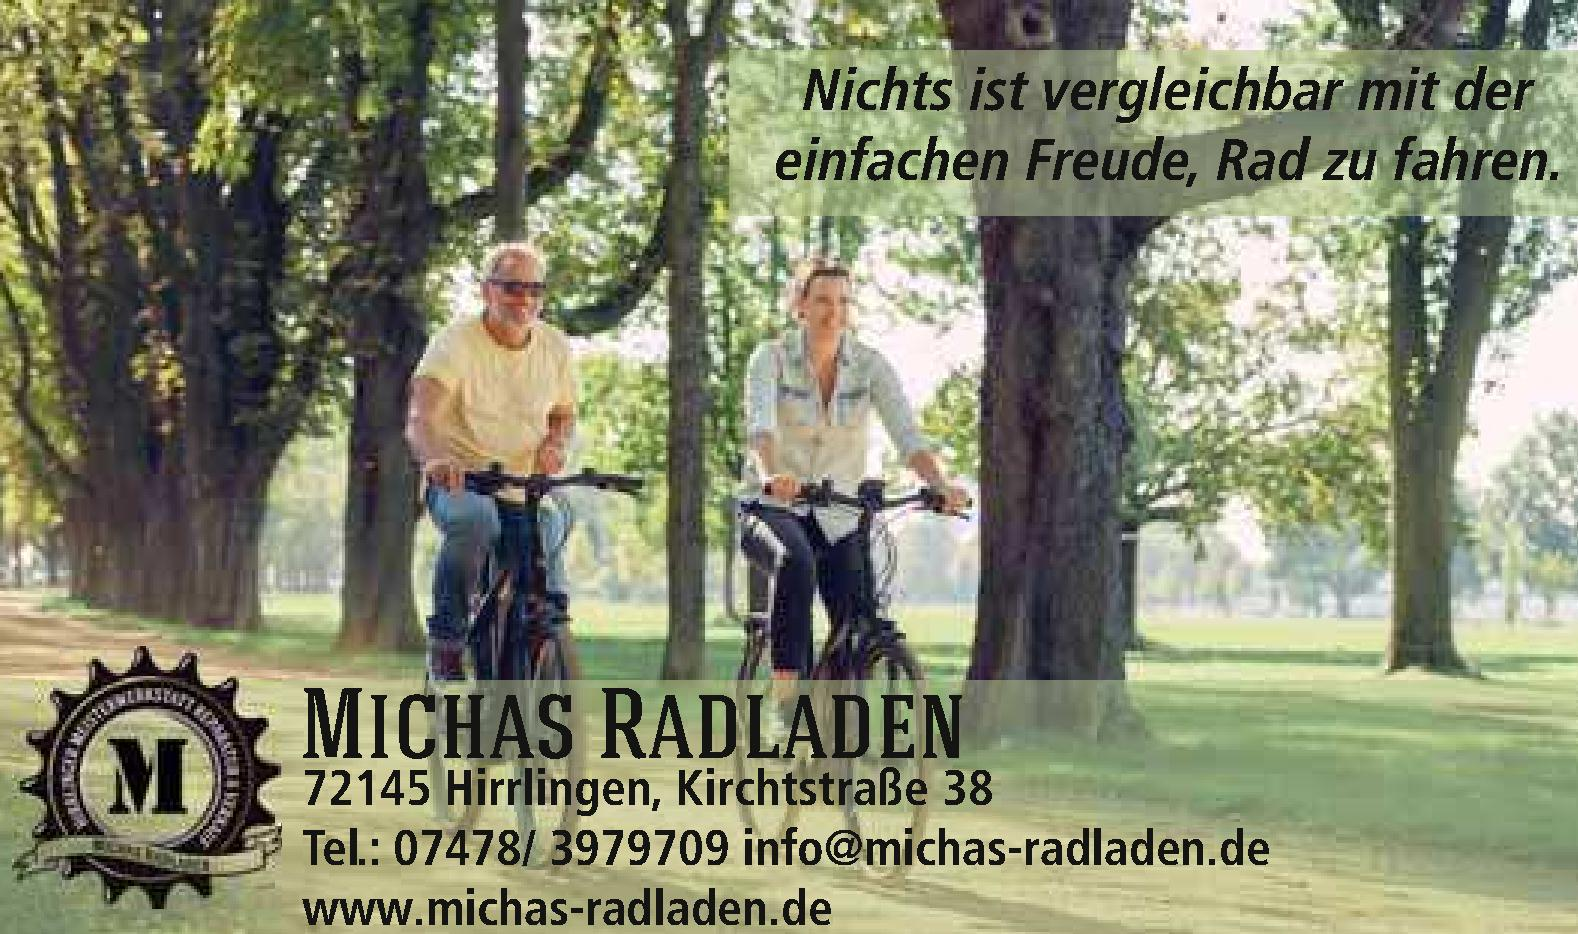 Michas Radladen